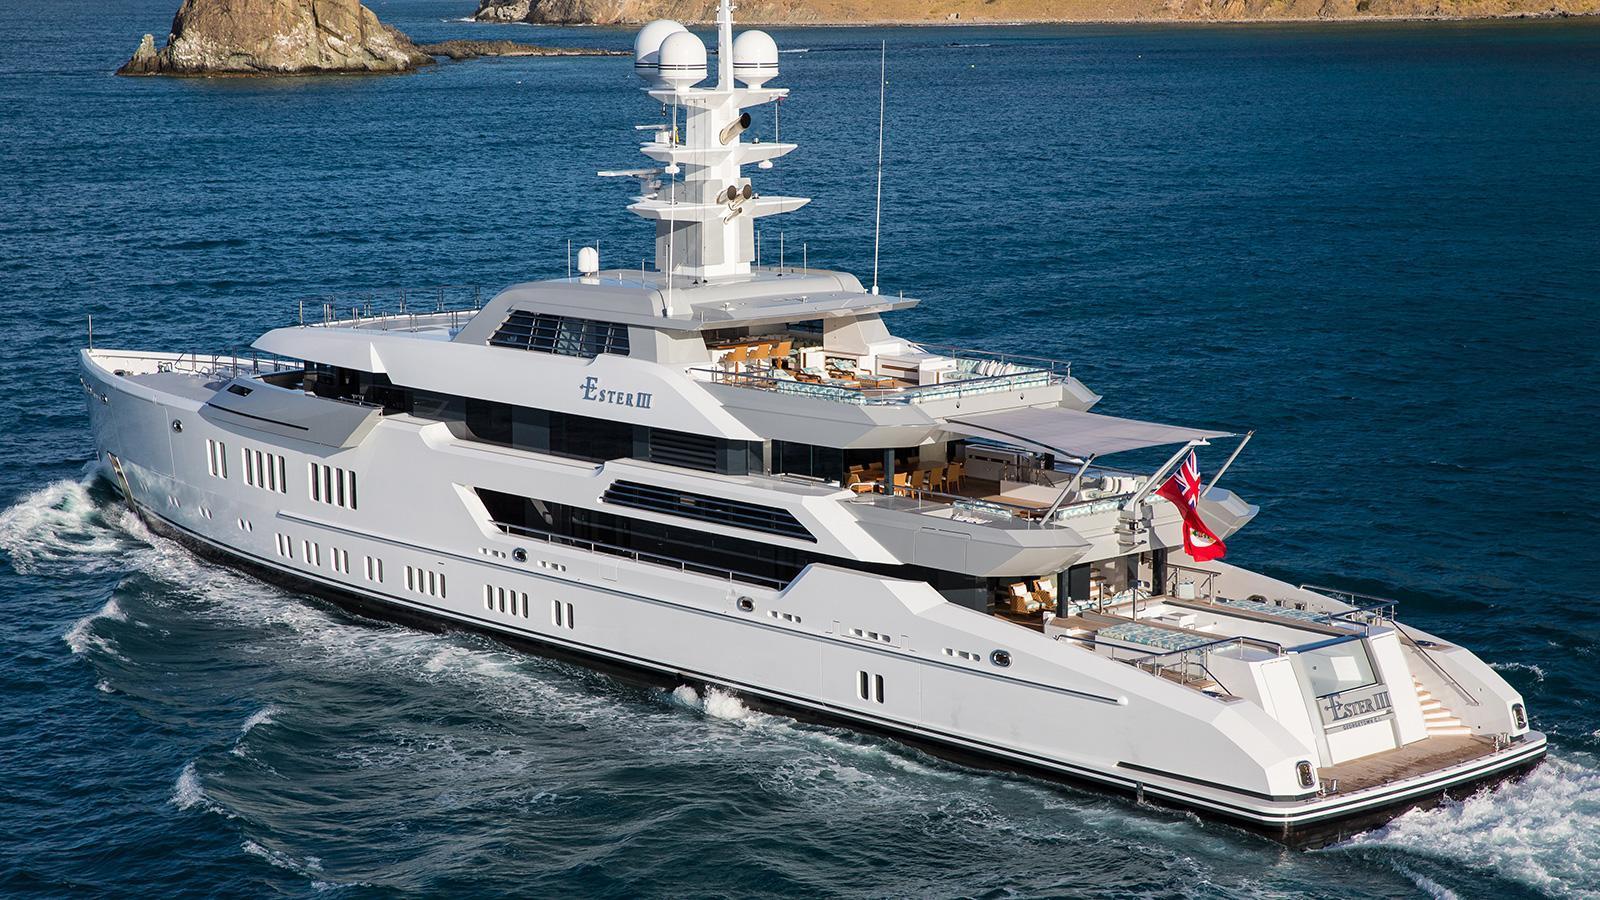 iroquois ester iii motor yacht lurssen 2014 66m cruising profile stern